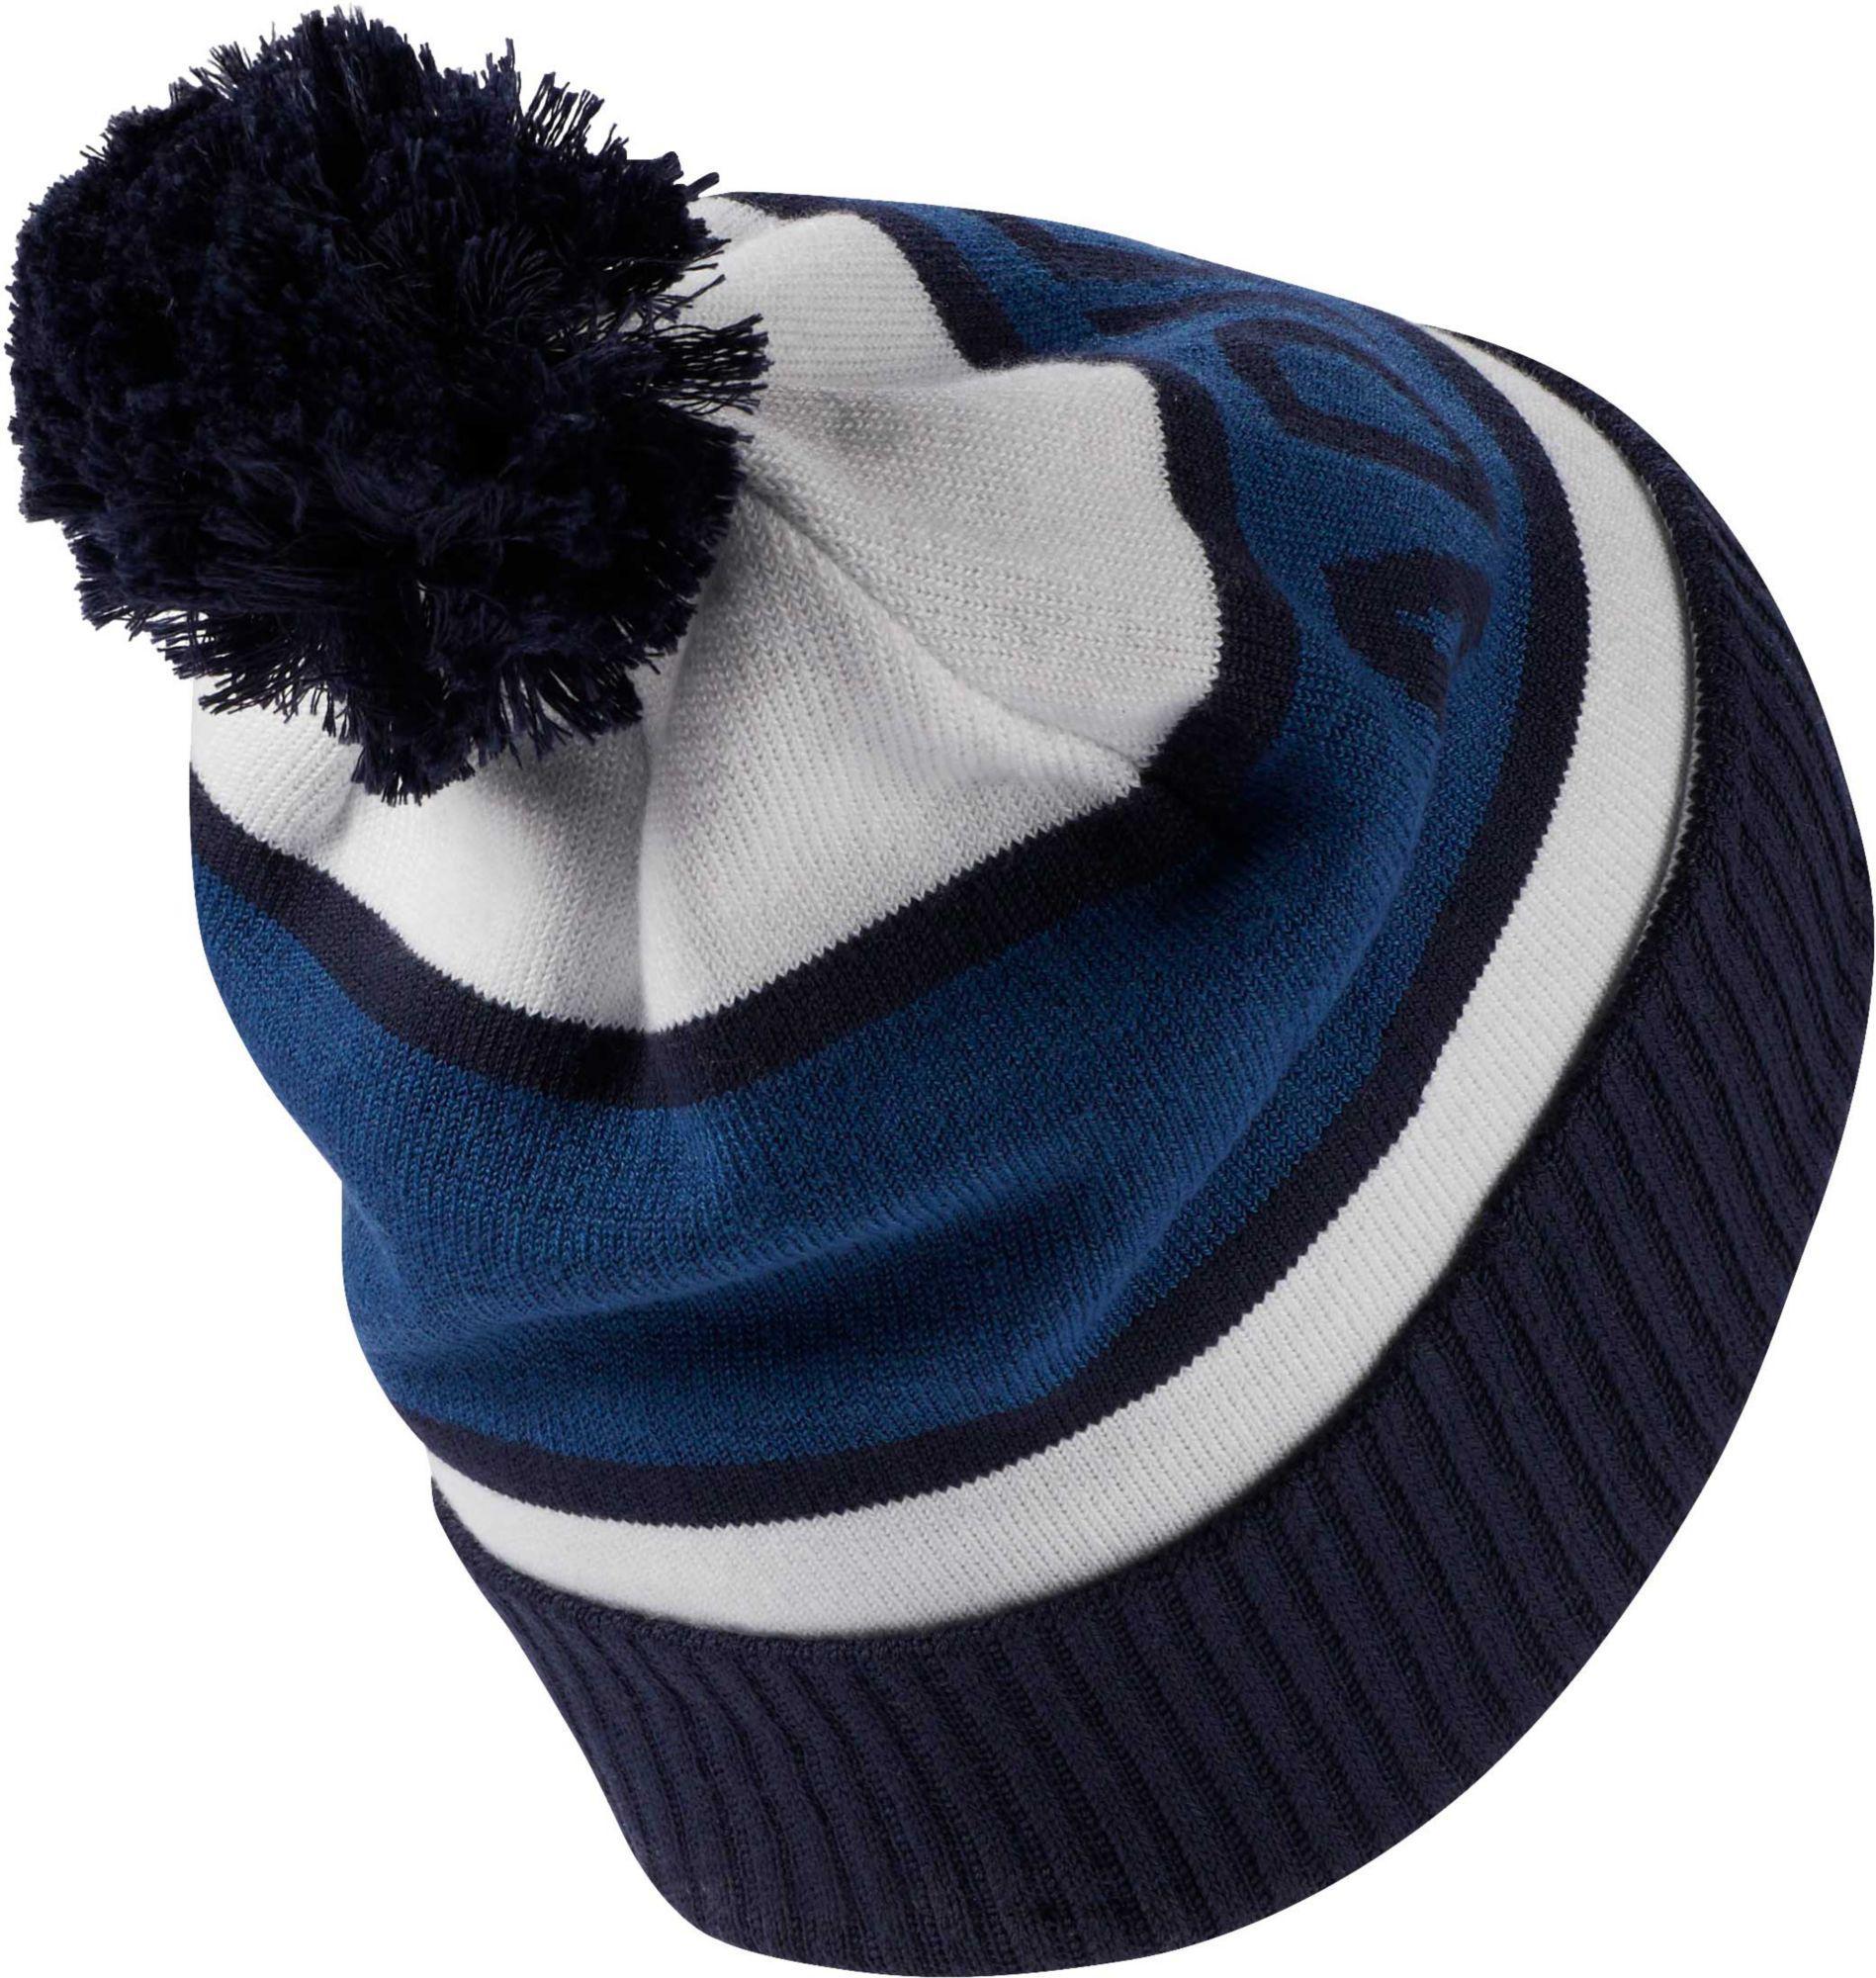 74691c7a238 Adidas - Blue Pom Golf Beanie for Men - Lyst. View fullscreen